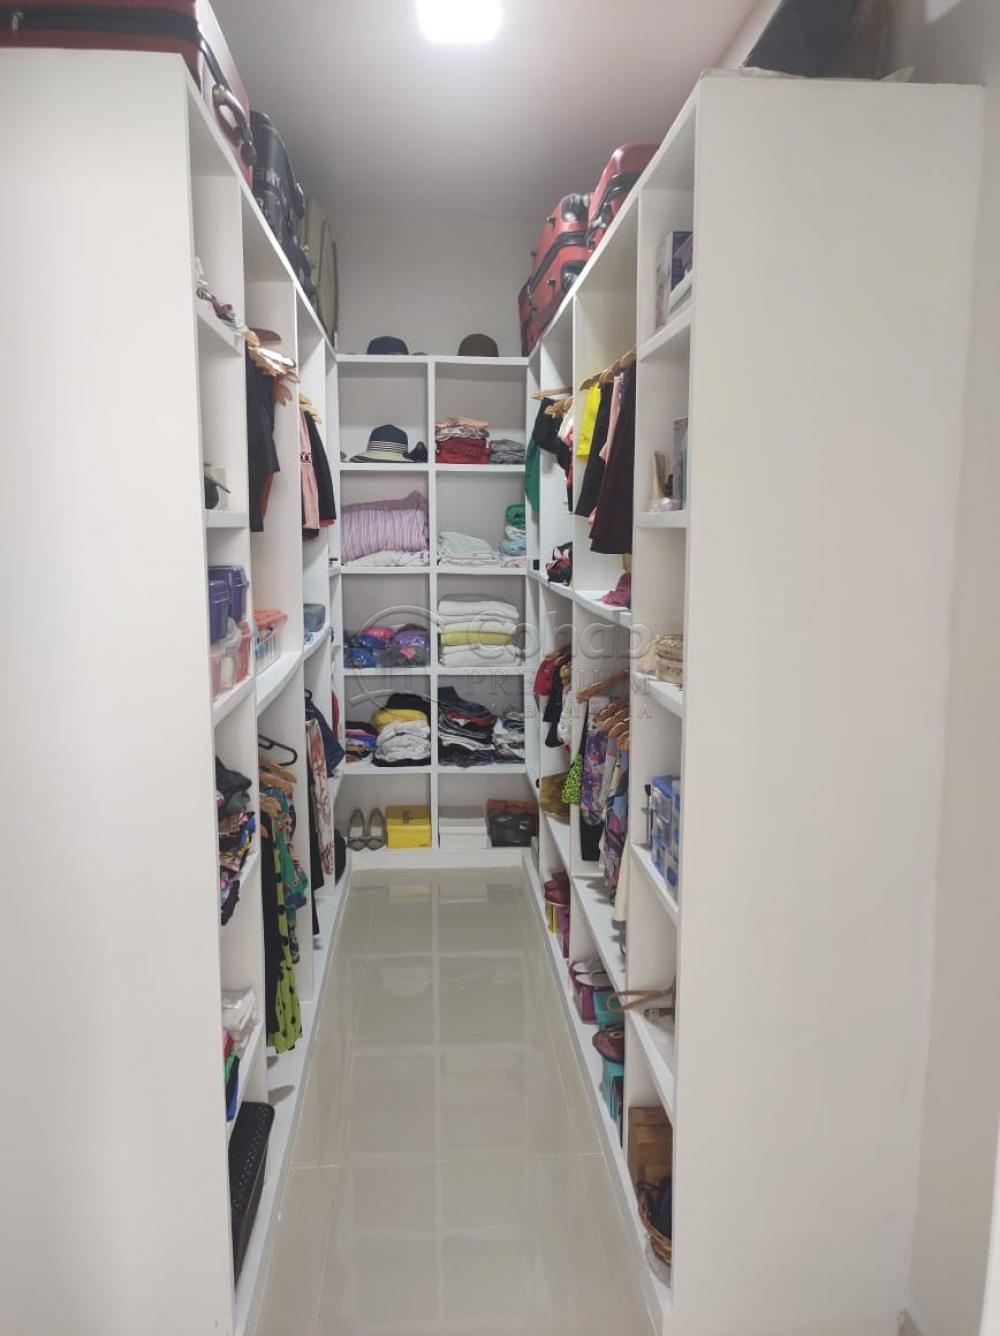 Comprar Casa / Condomínio em Aracaju R$ 890.000,00 - Foto 9